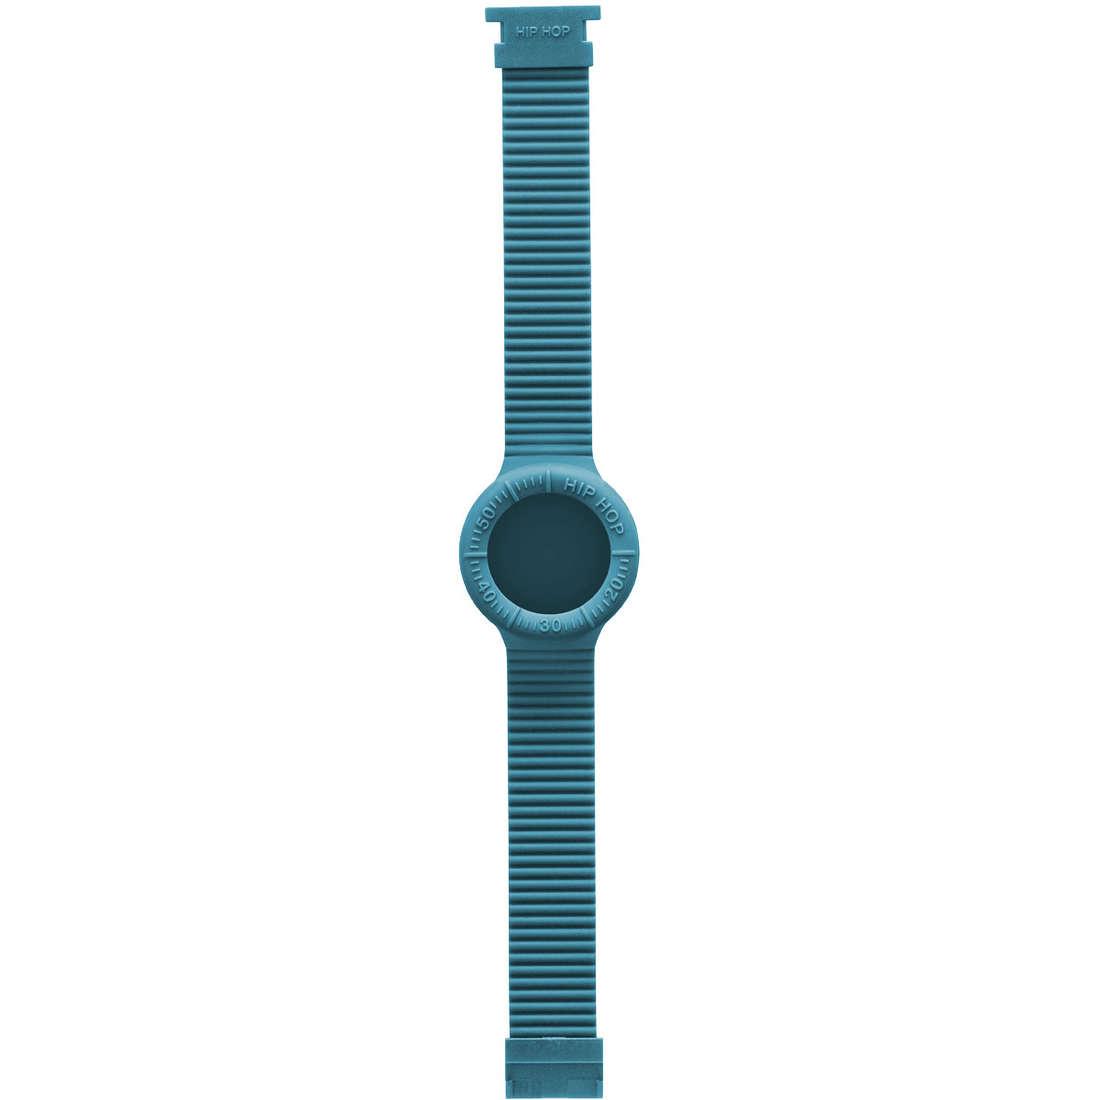 orologio accessorio unisex Hip Hop HBU0120